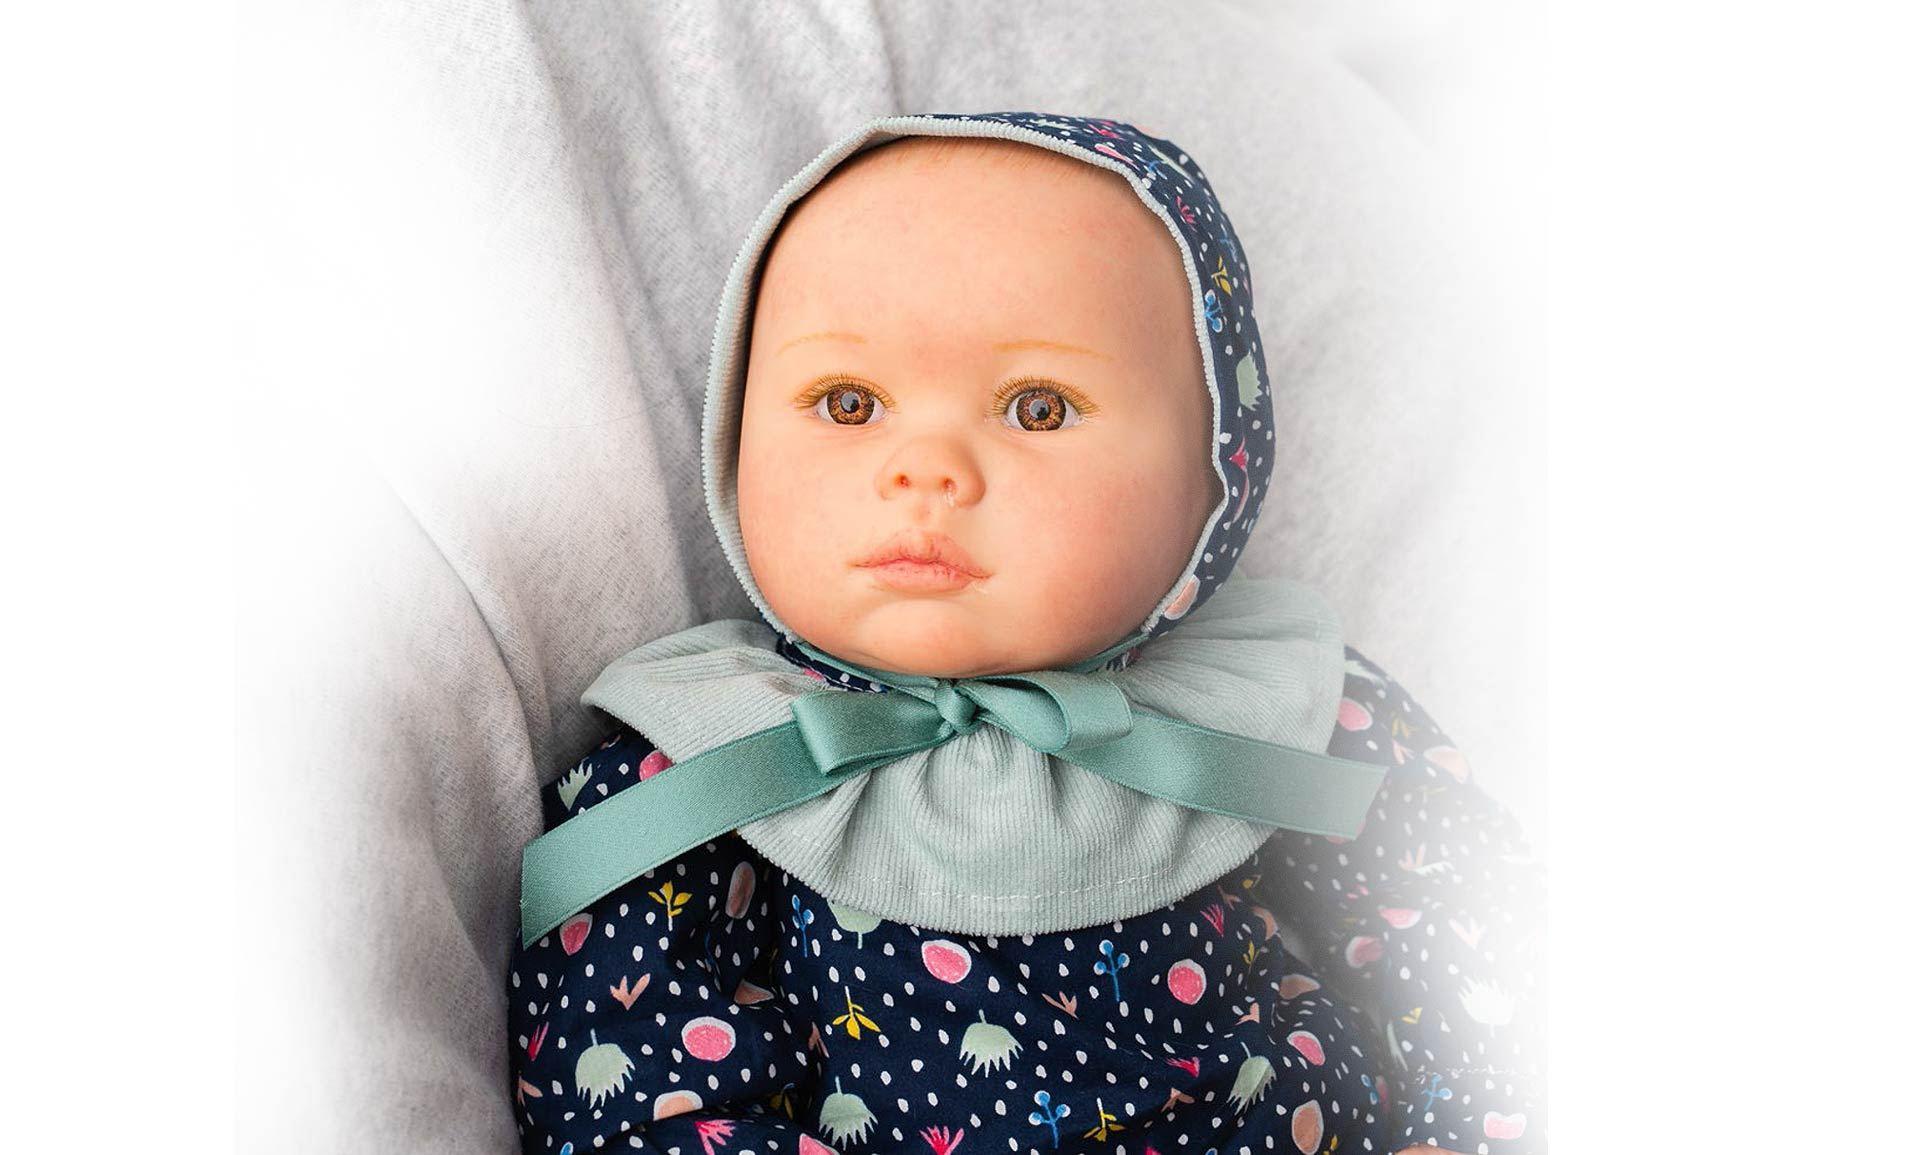 Tête poupée reborn